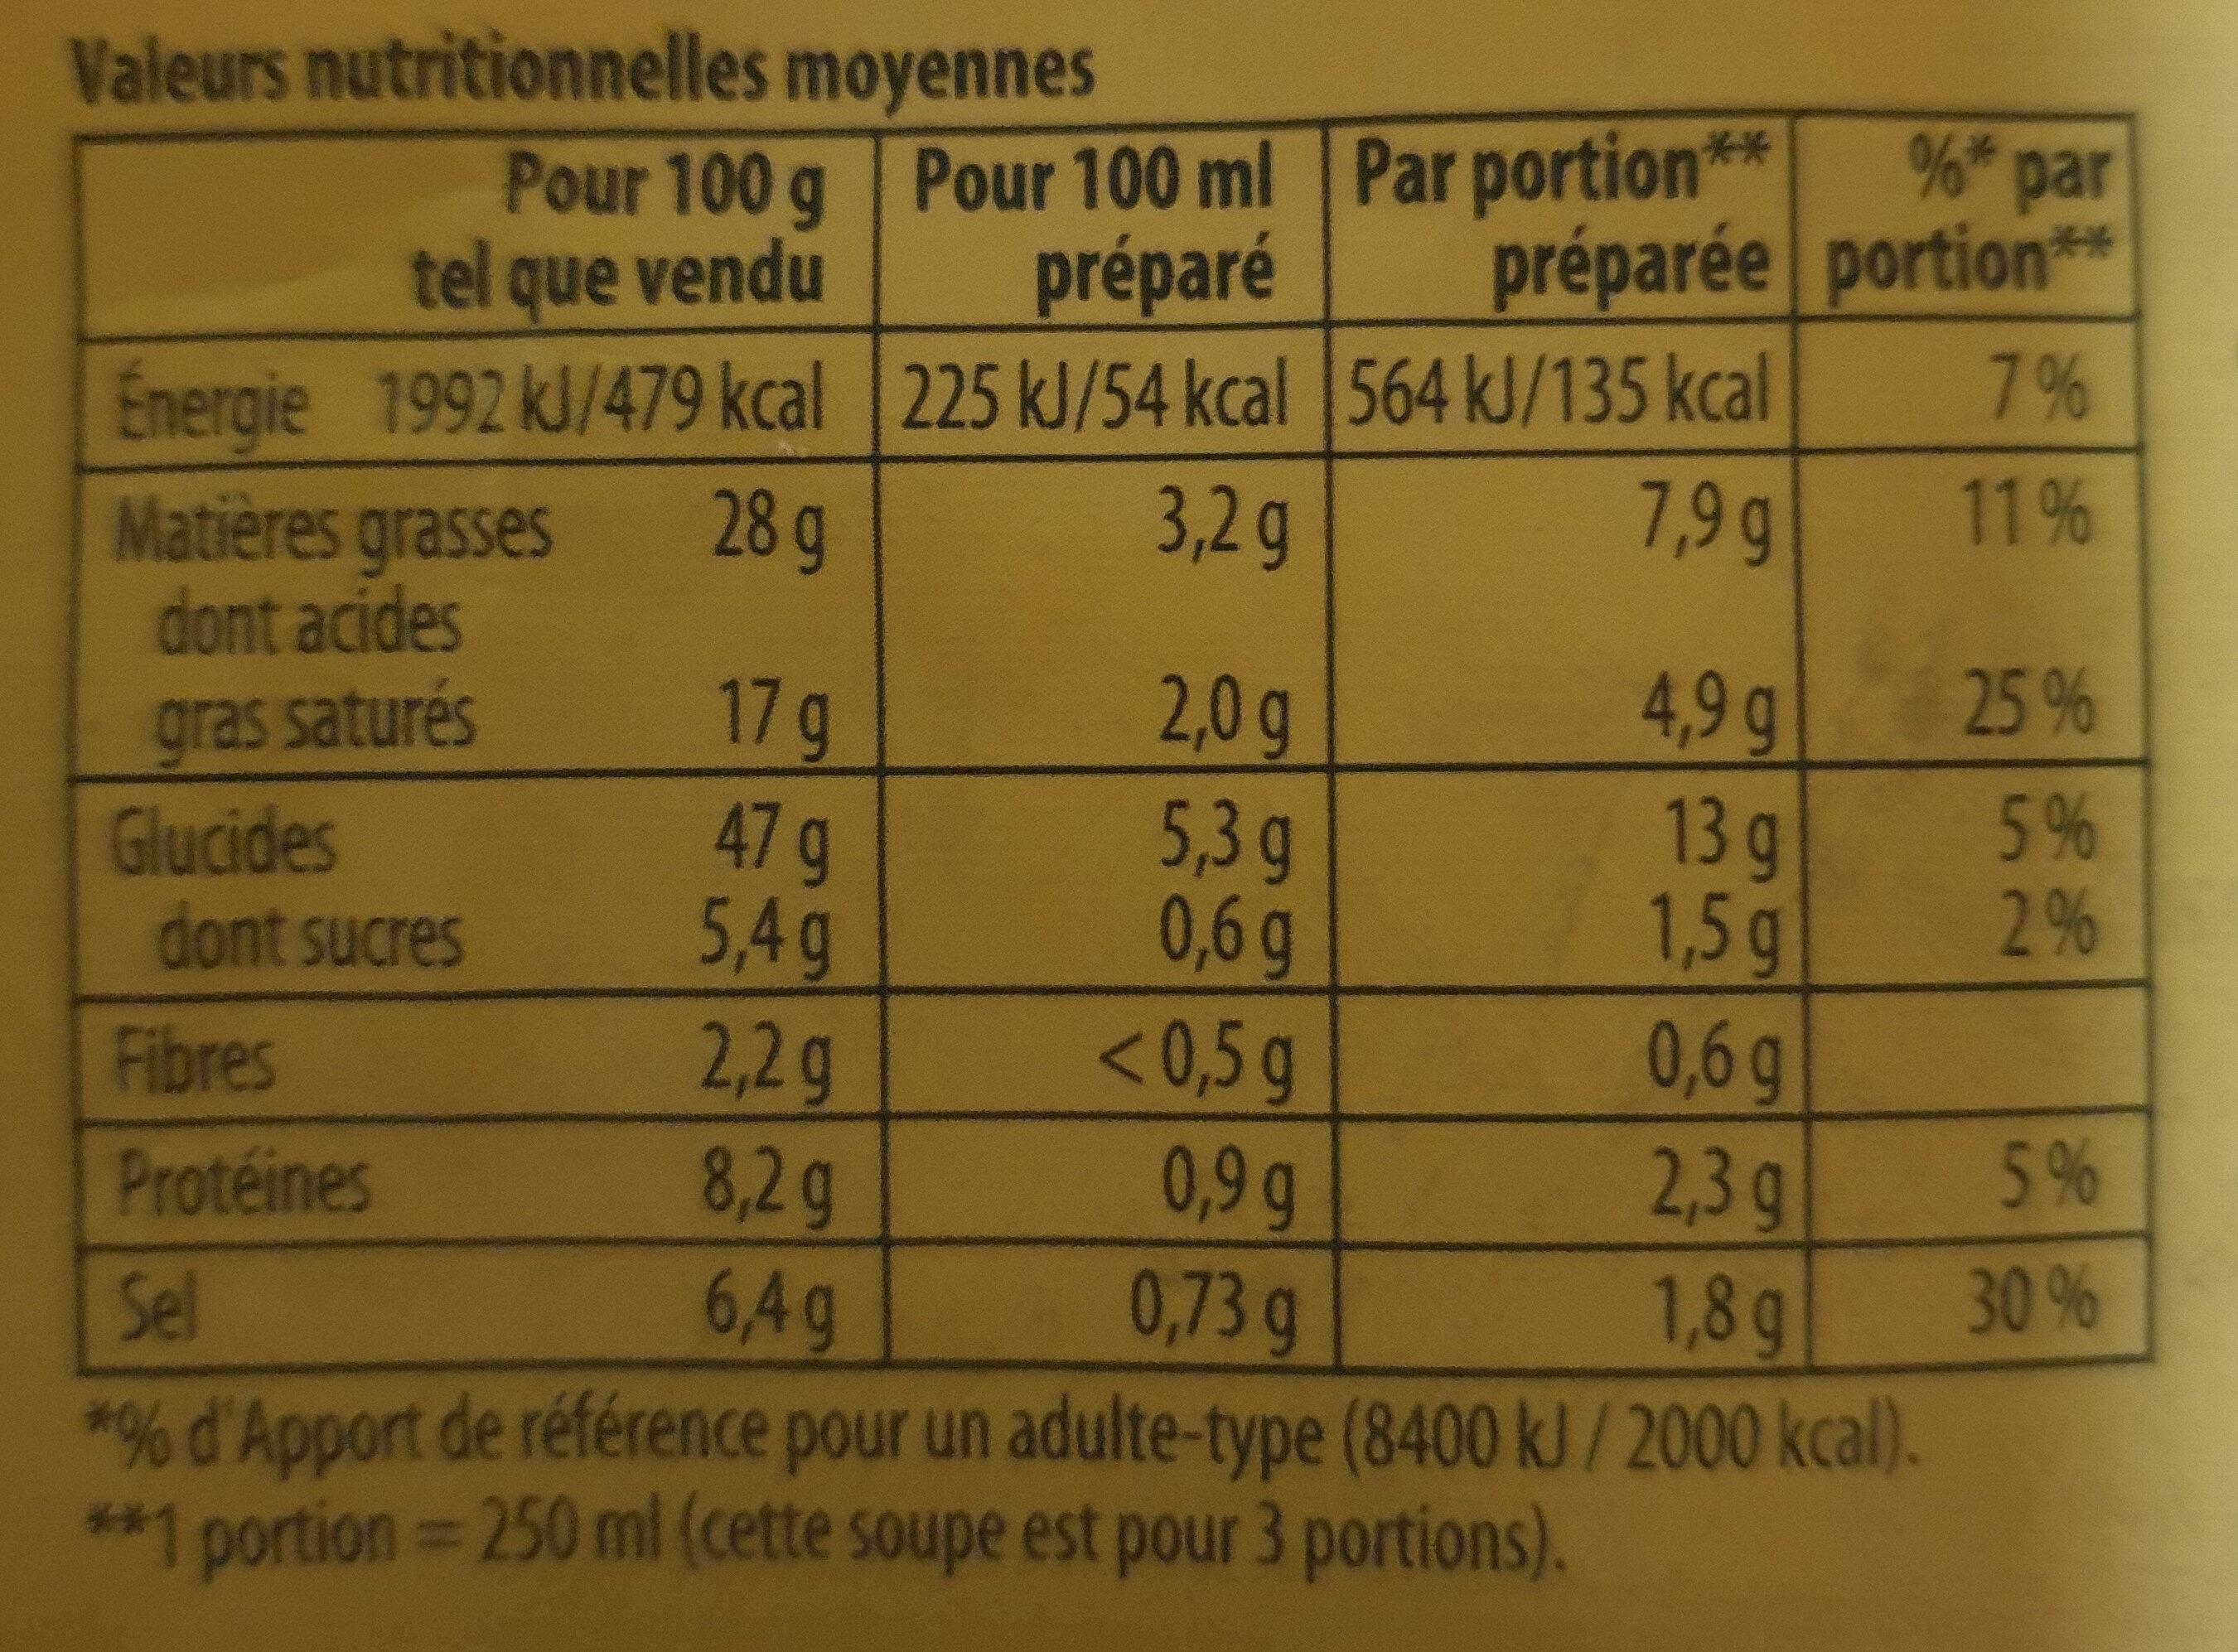 Knorr Soupe Forestière Champignons 85g 3 Portions - Voedingswaarden - fr